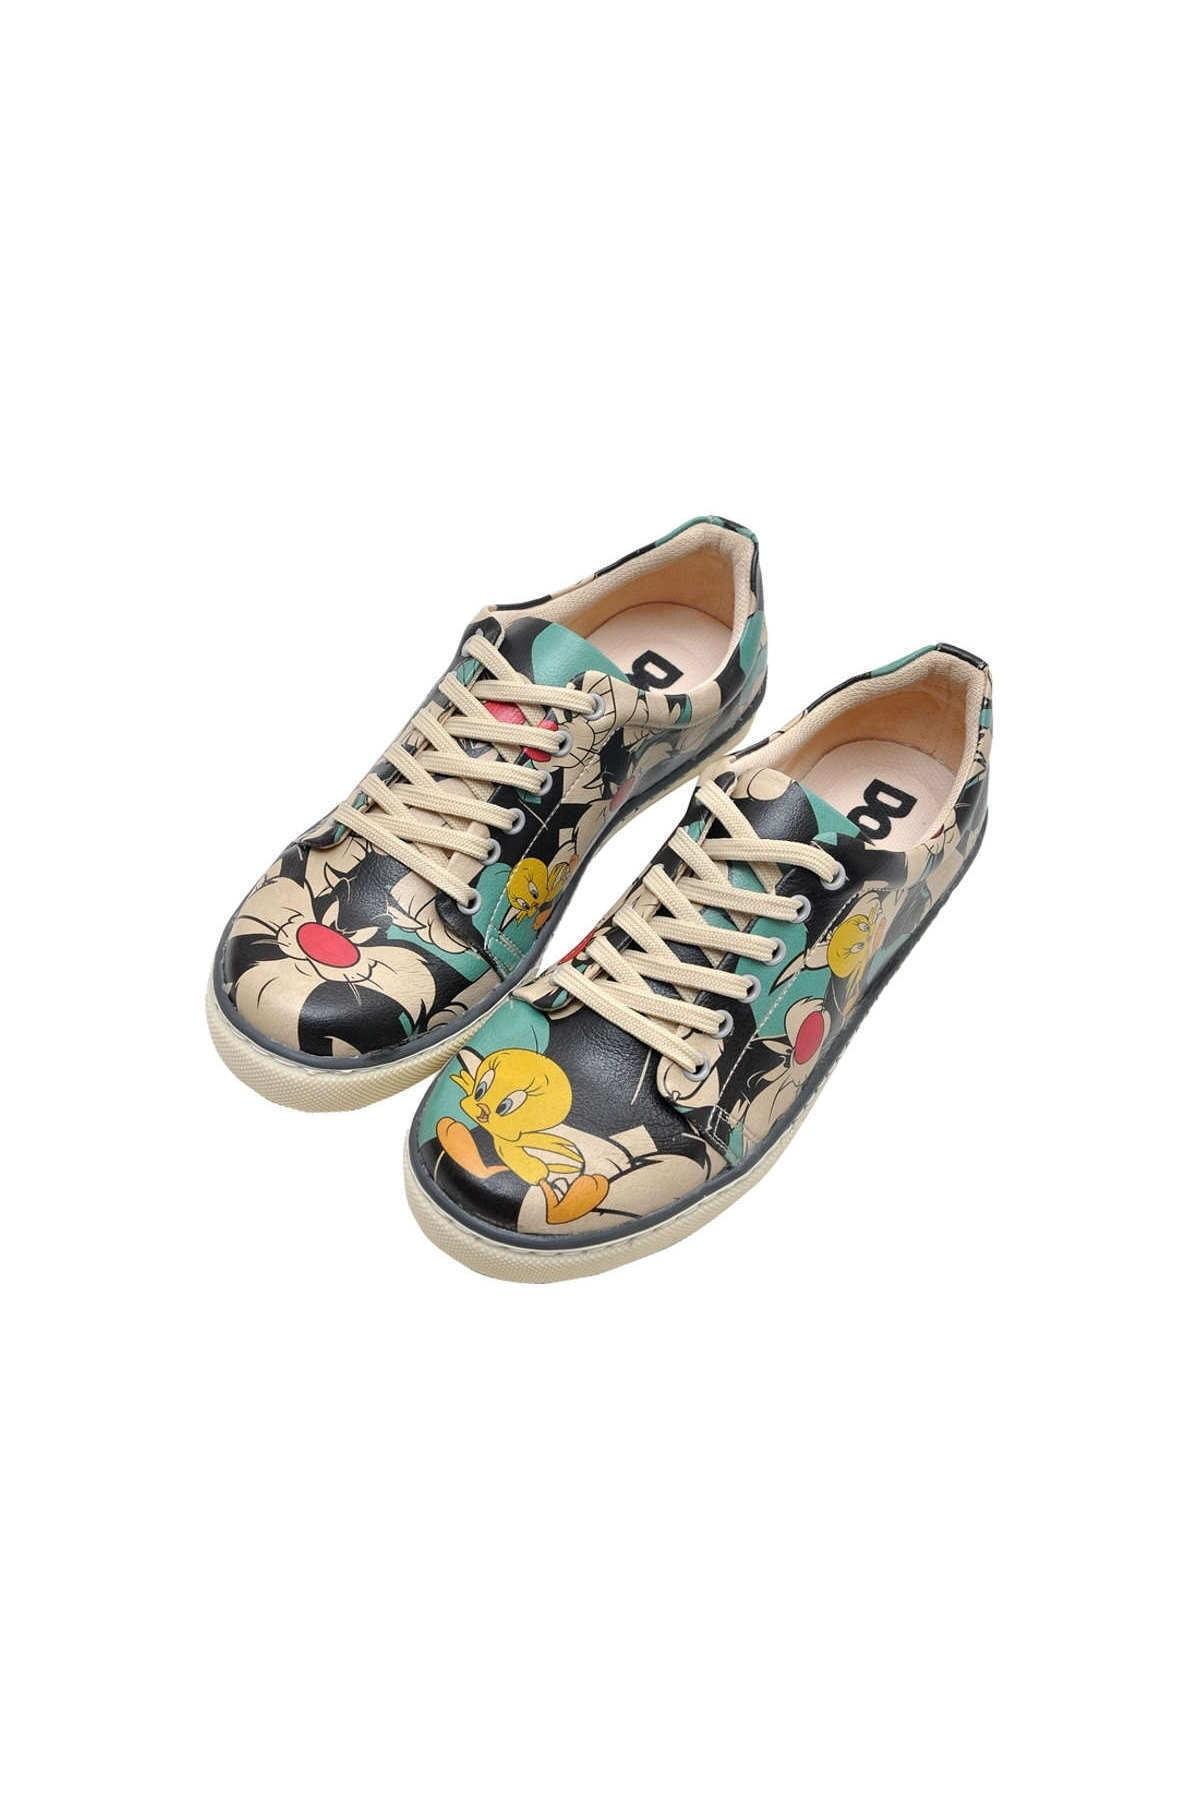 Dogo Catch Me If You Can Tweety / Sneakers Kadin Ayakkabi 1